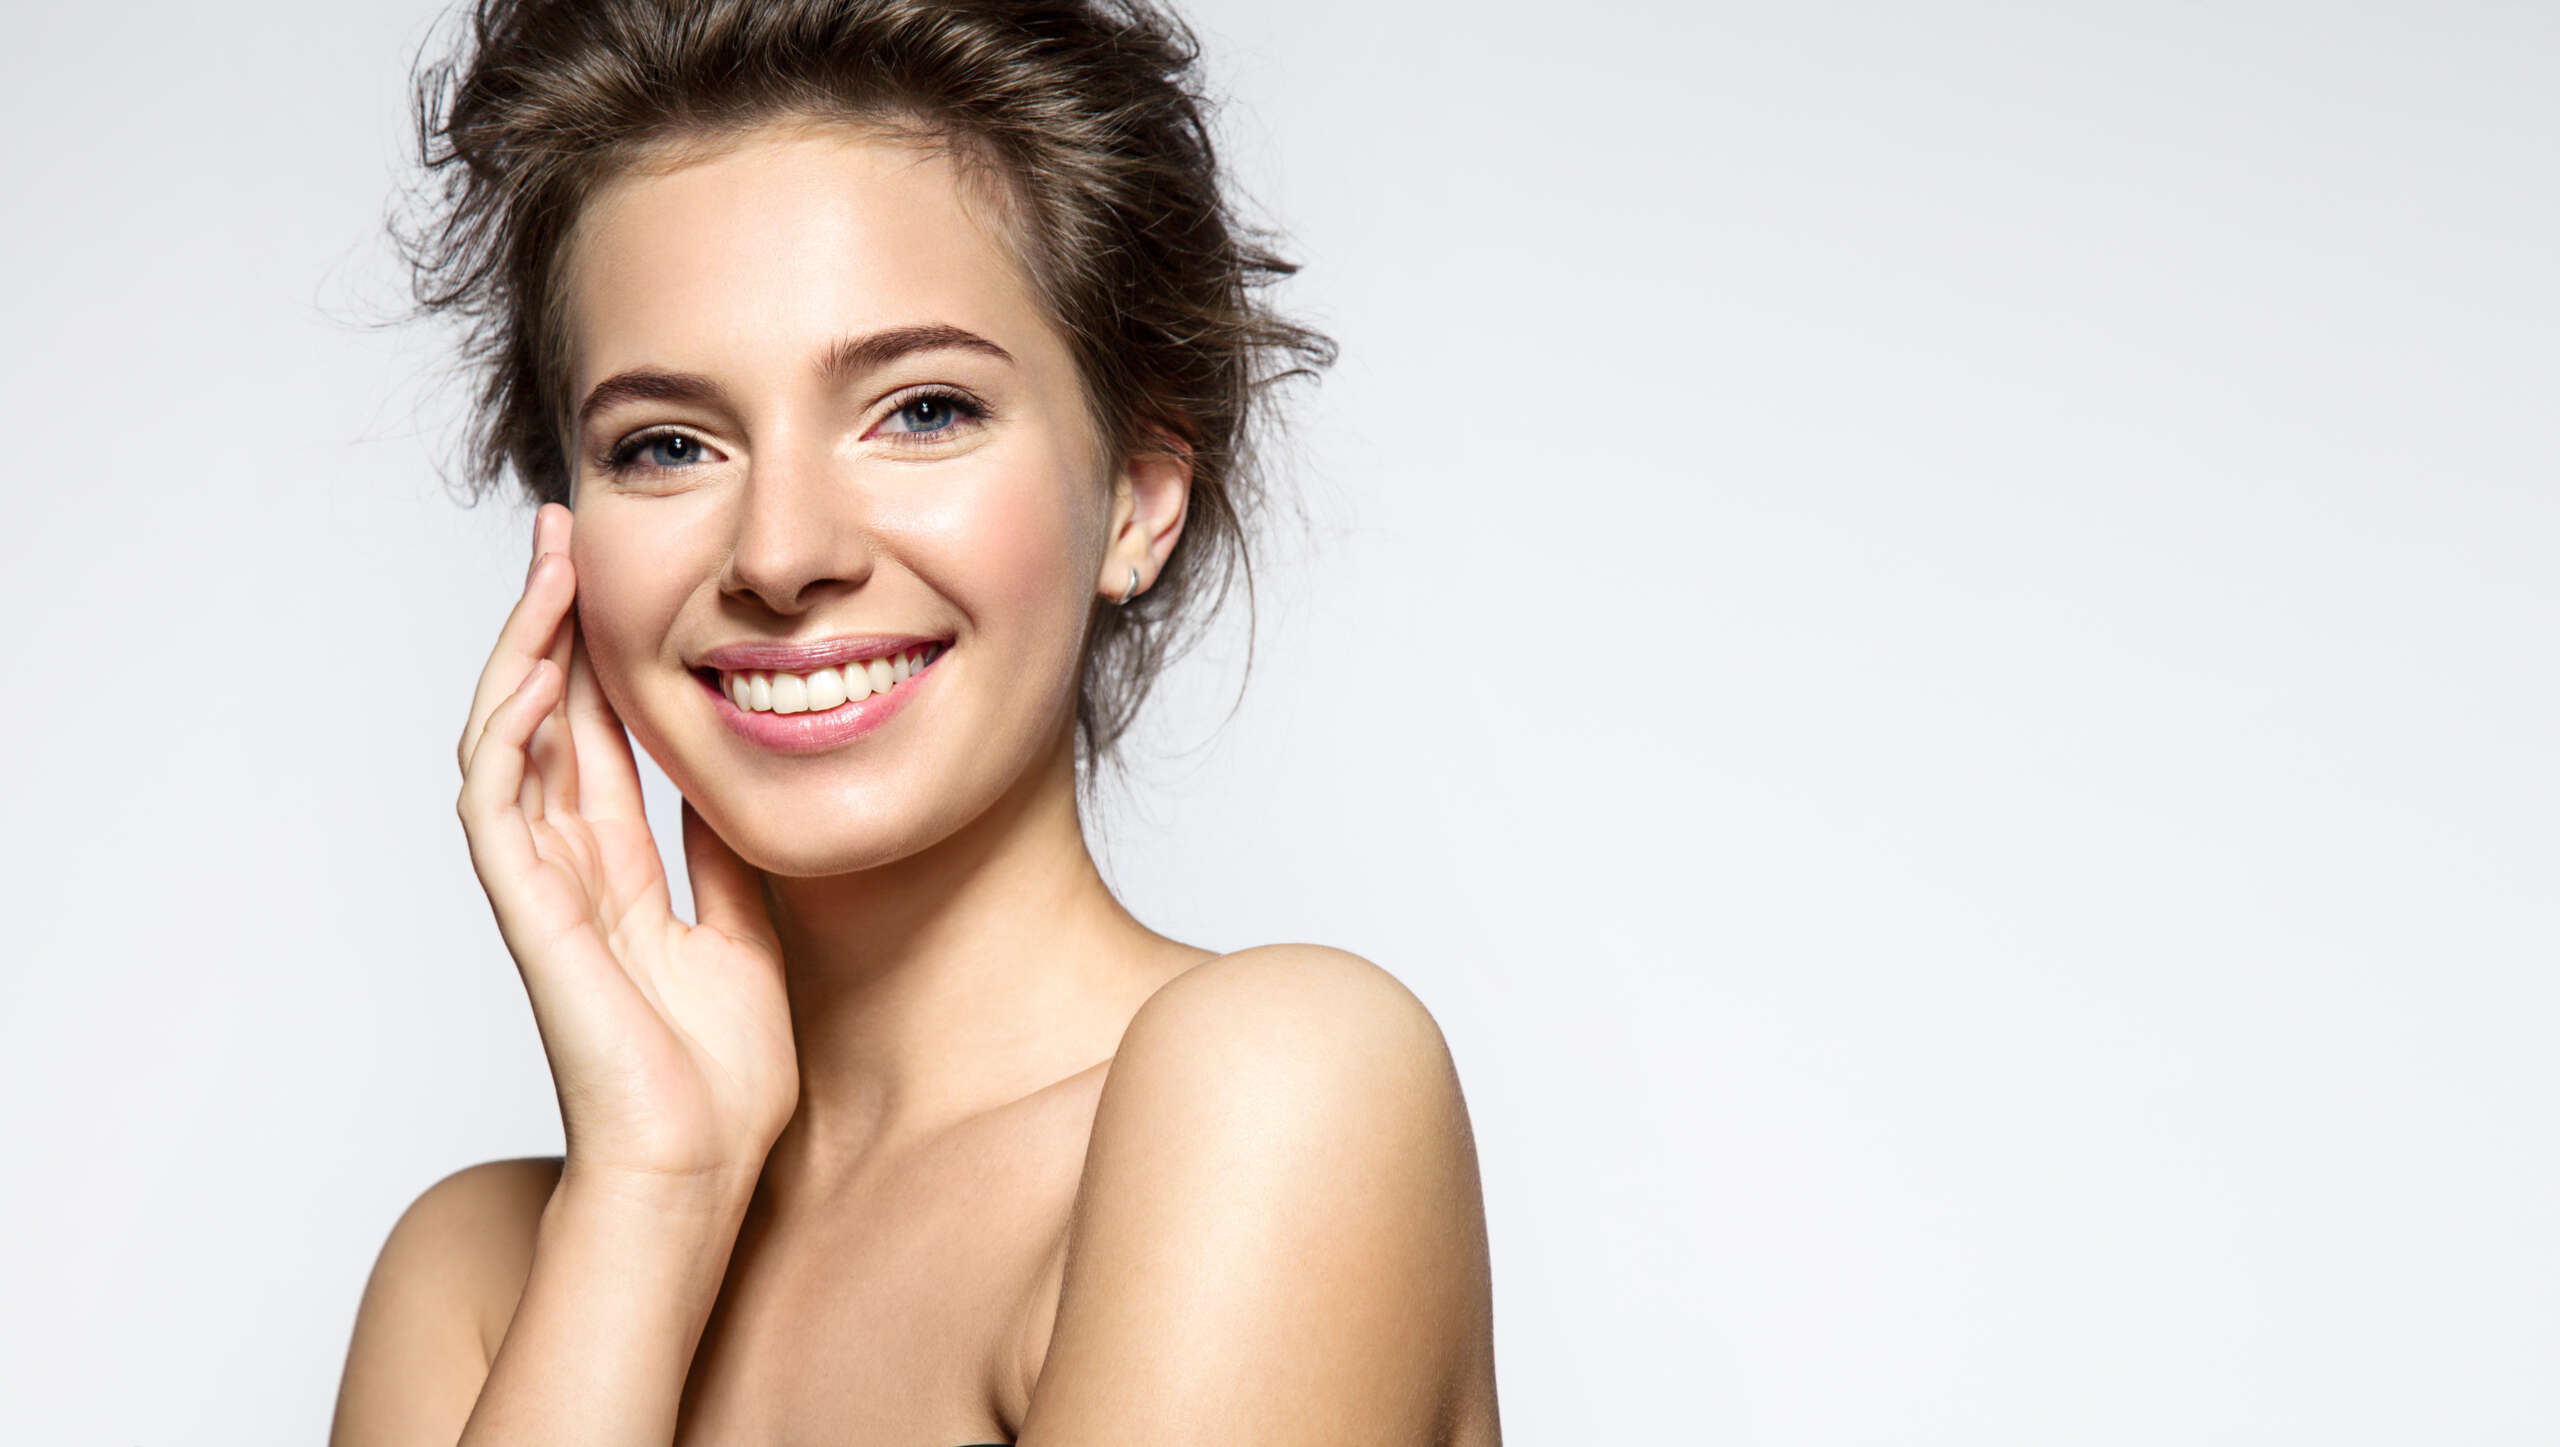 LumiHYDRO Medical-Grade Facial Device Suppliers